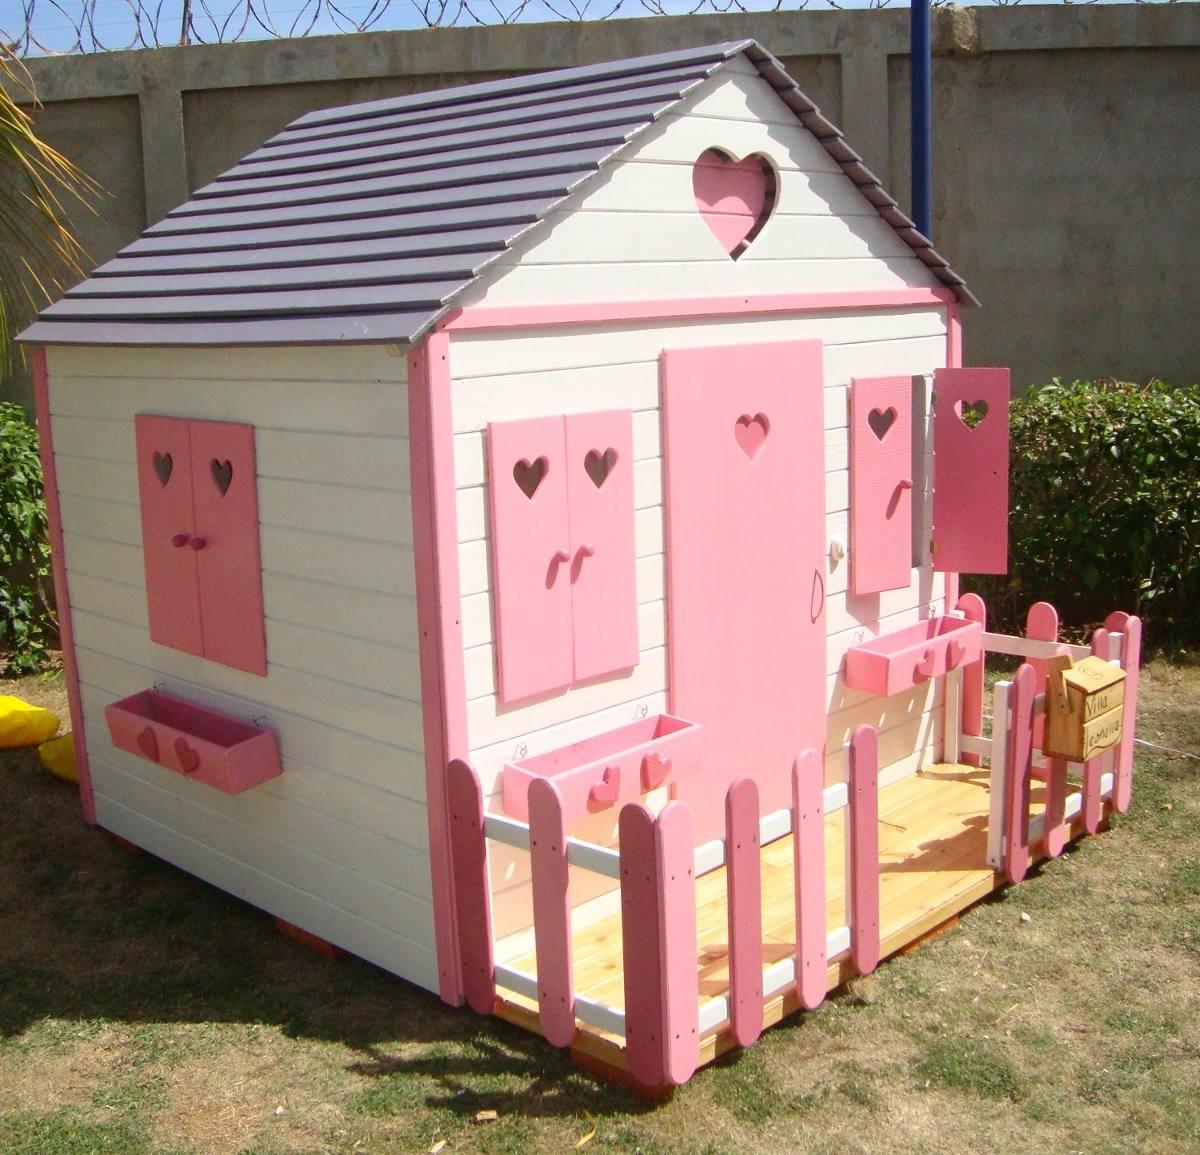 Casa ni as juguete grande madera para jardines bs for Casa de juguetes para jardin